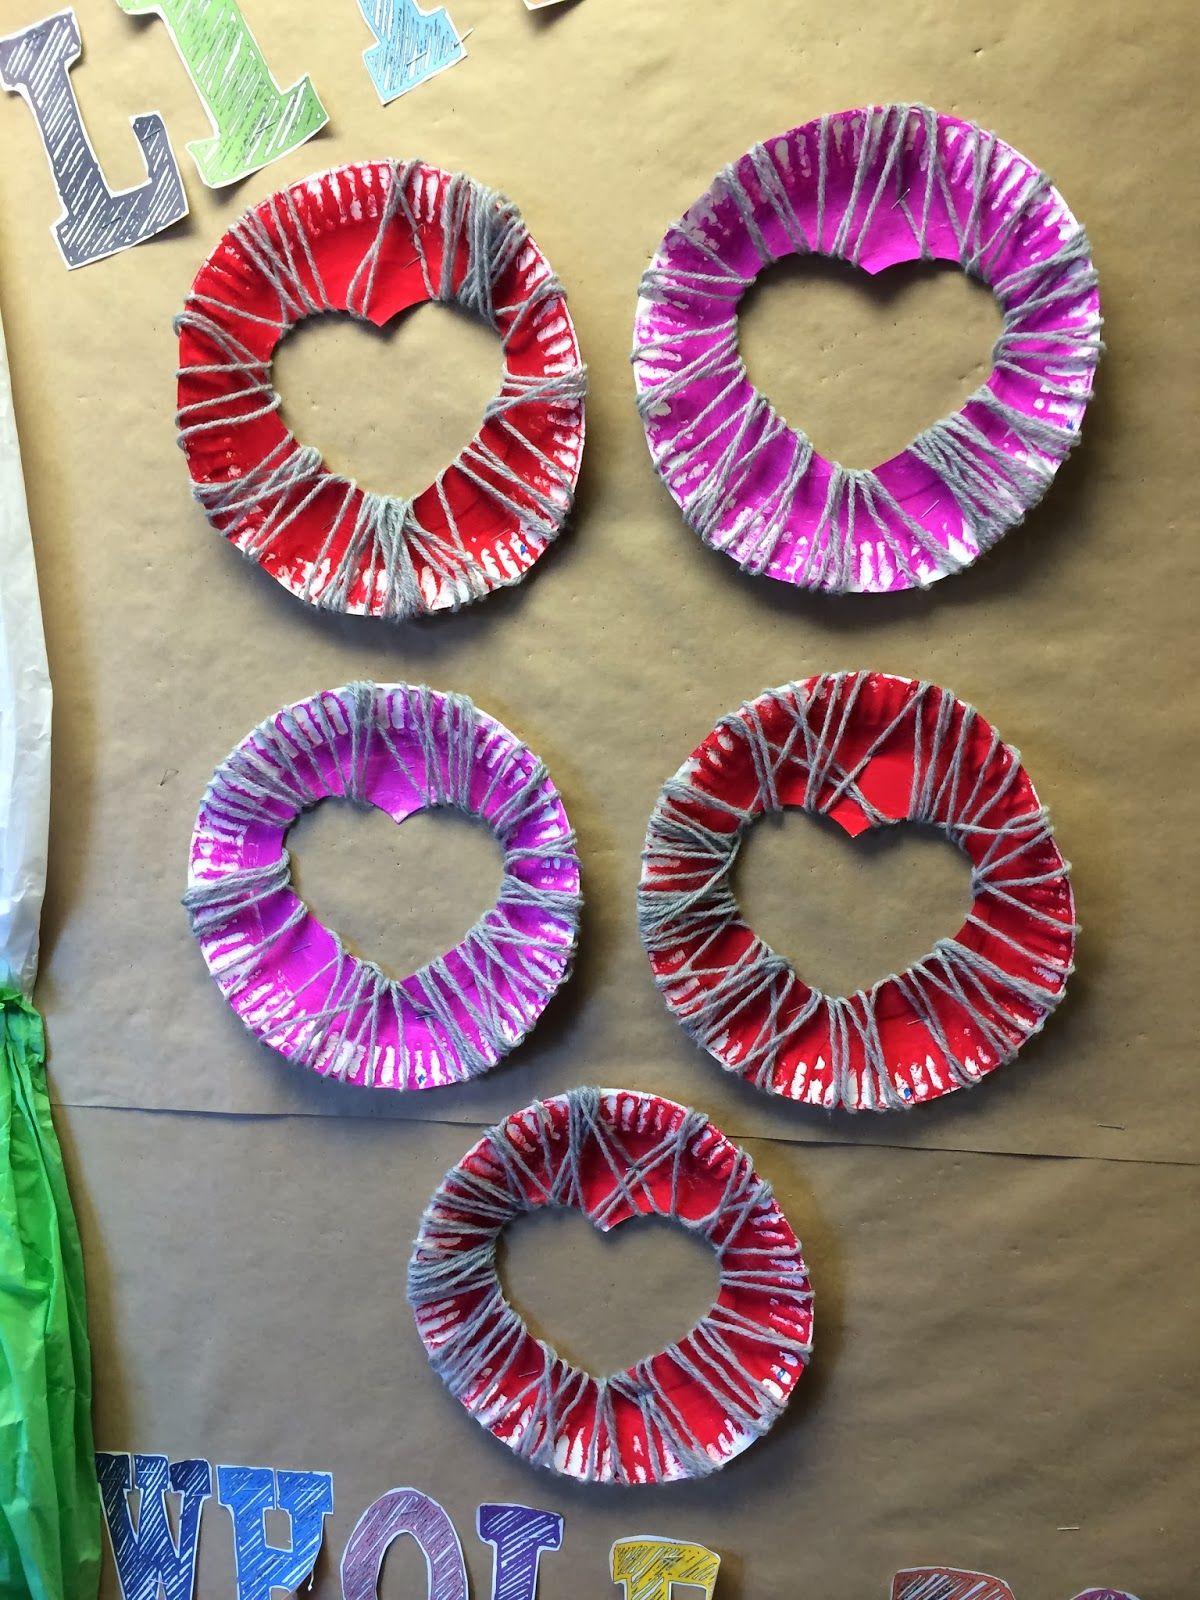 40bce0ab03cc93c5ea2e2454ed45950f - Valentines Day Crafts For Kindergarten